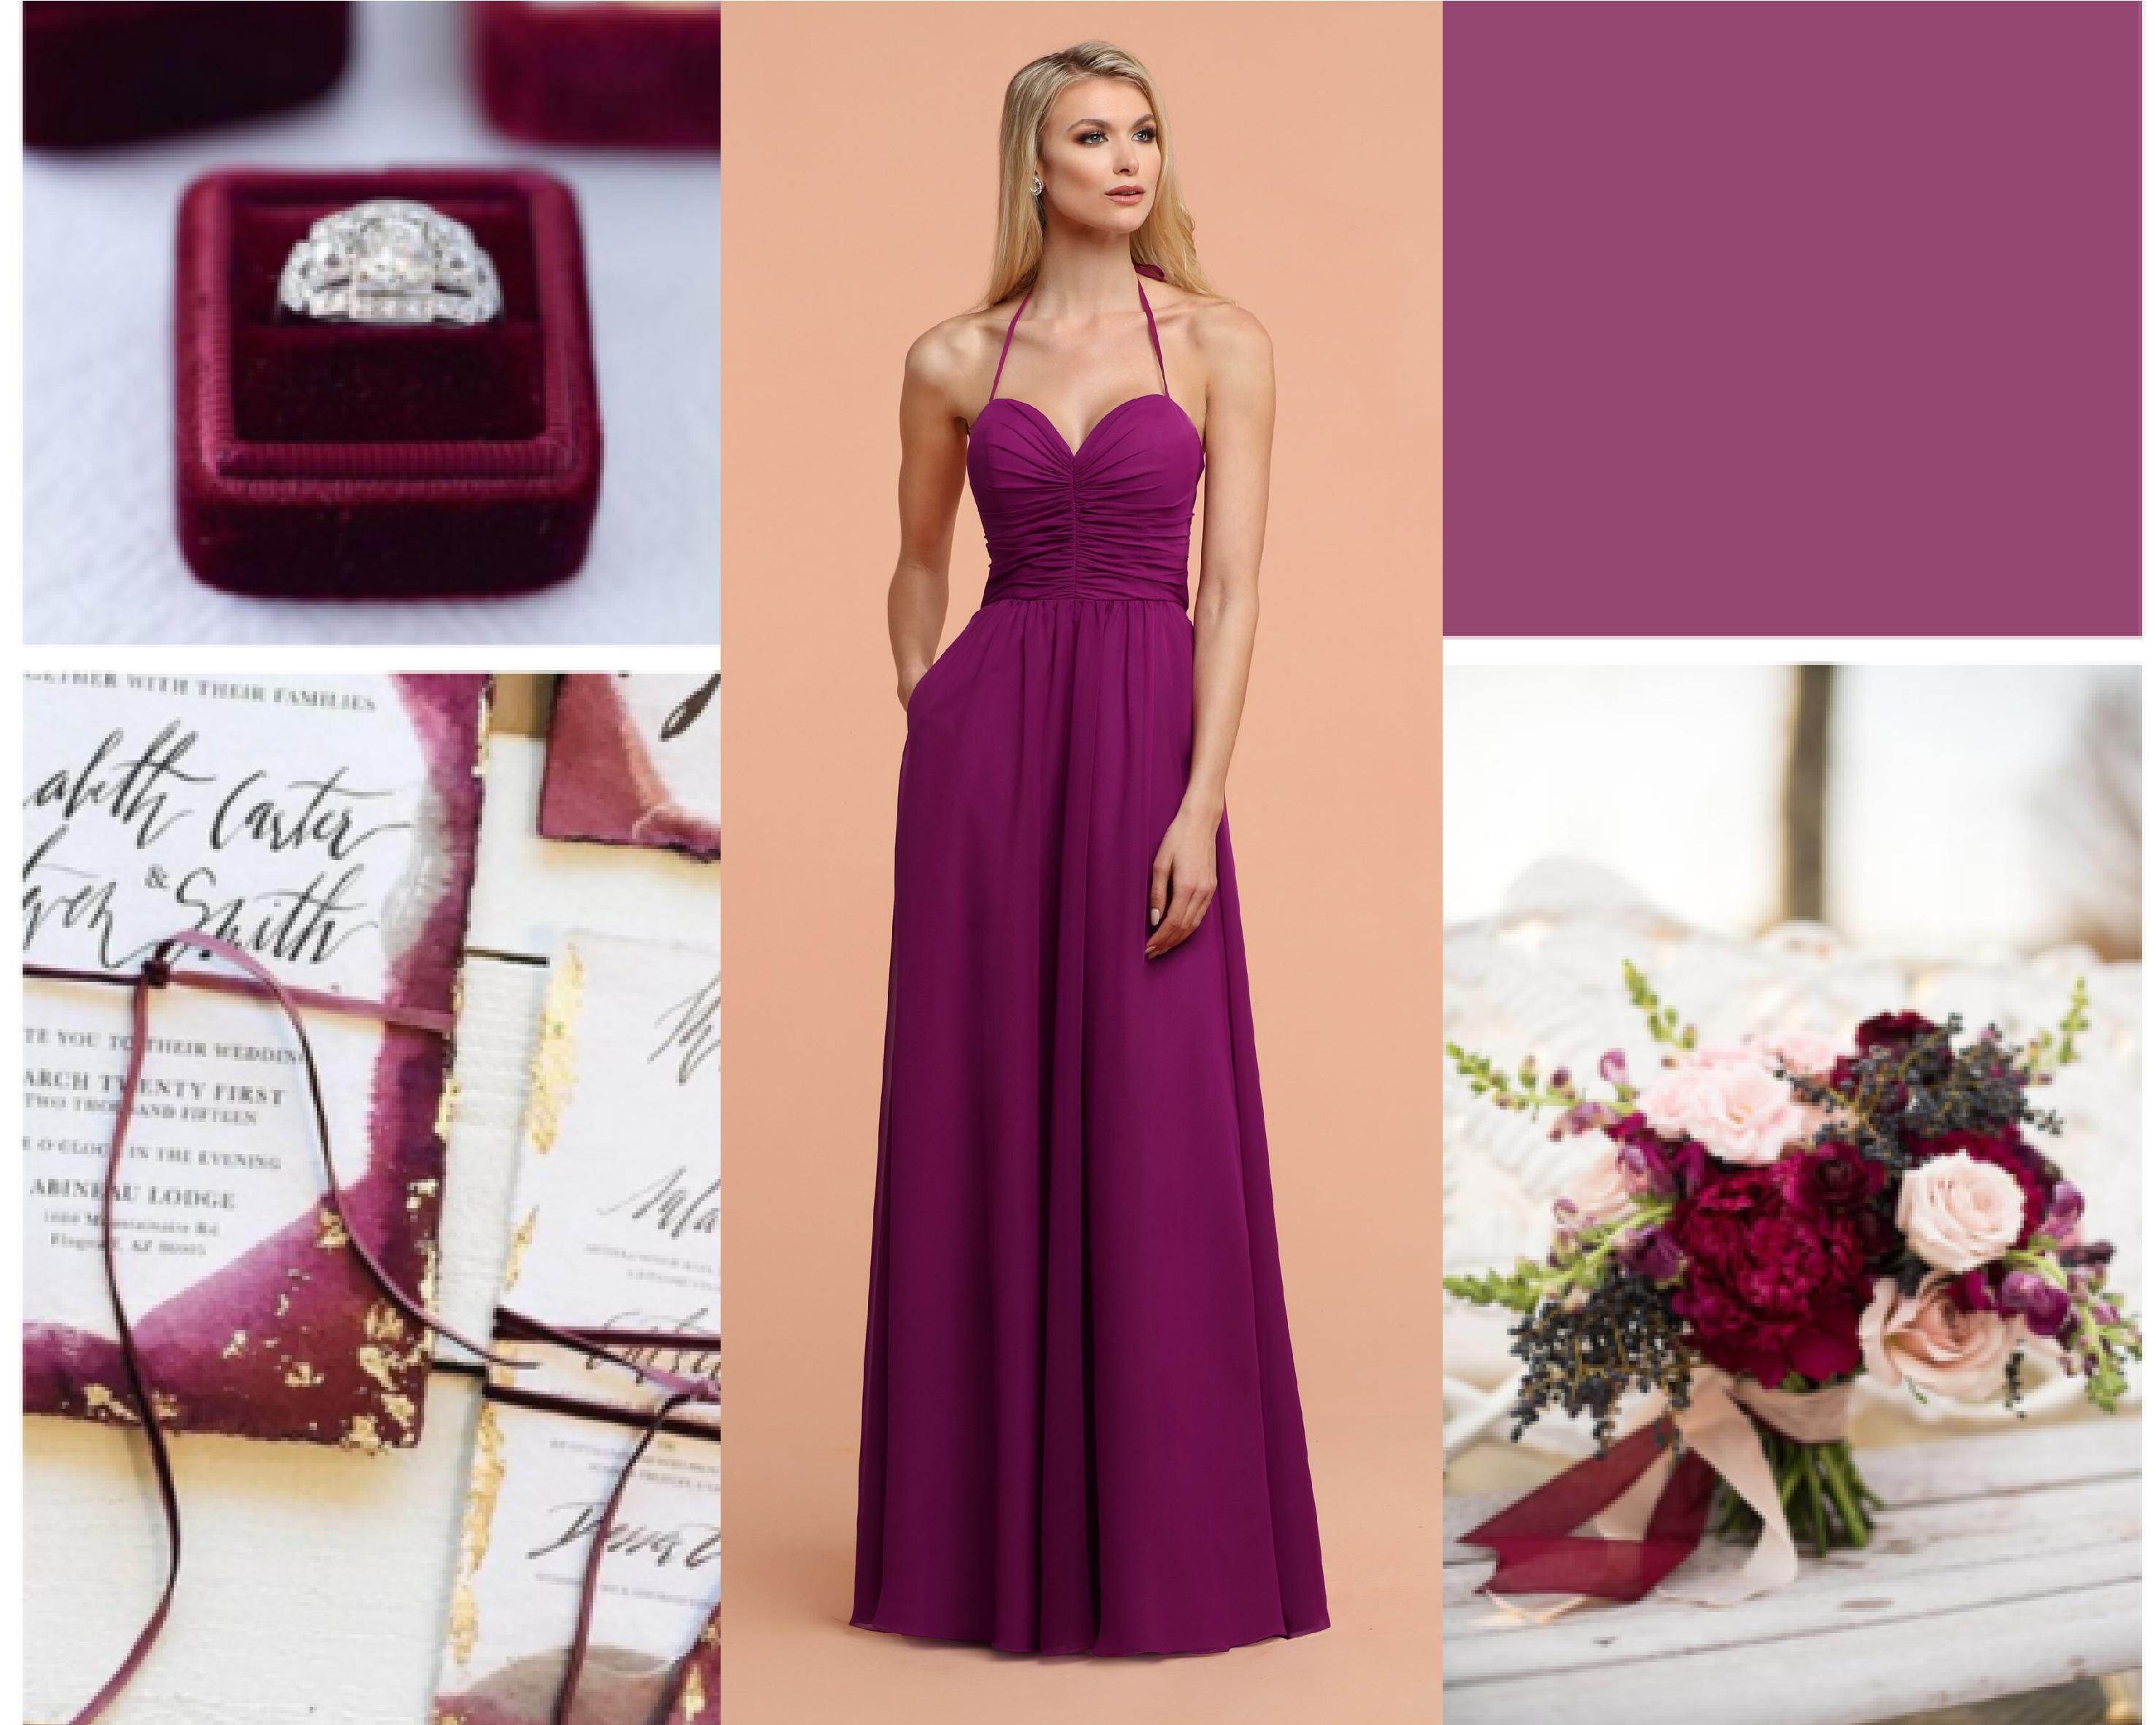 2020 Bridesmaid Dresses Color Trends Cassis Davinci Bridal,Satin V Neck Mermaid Wedding Dress